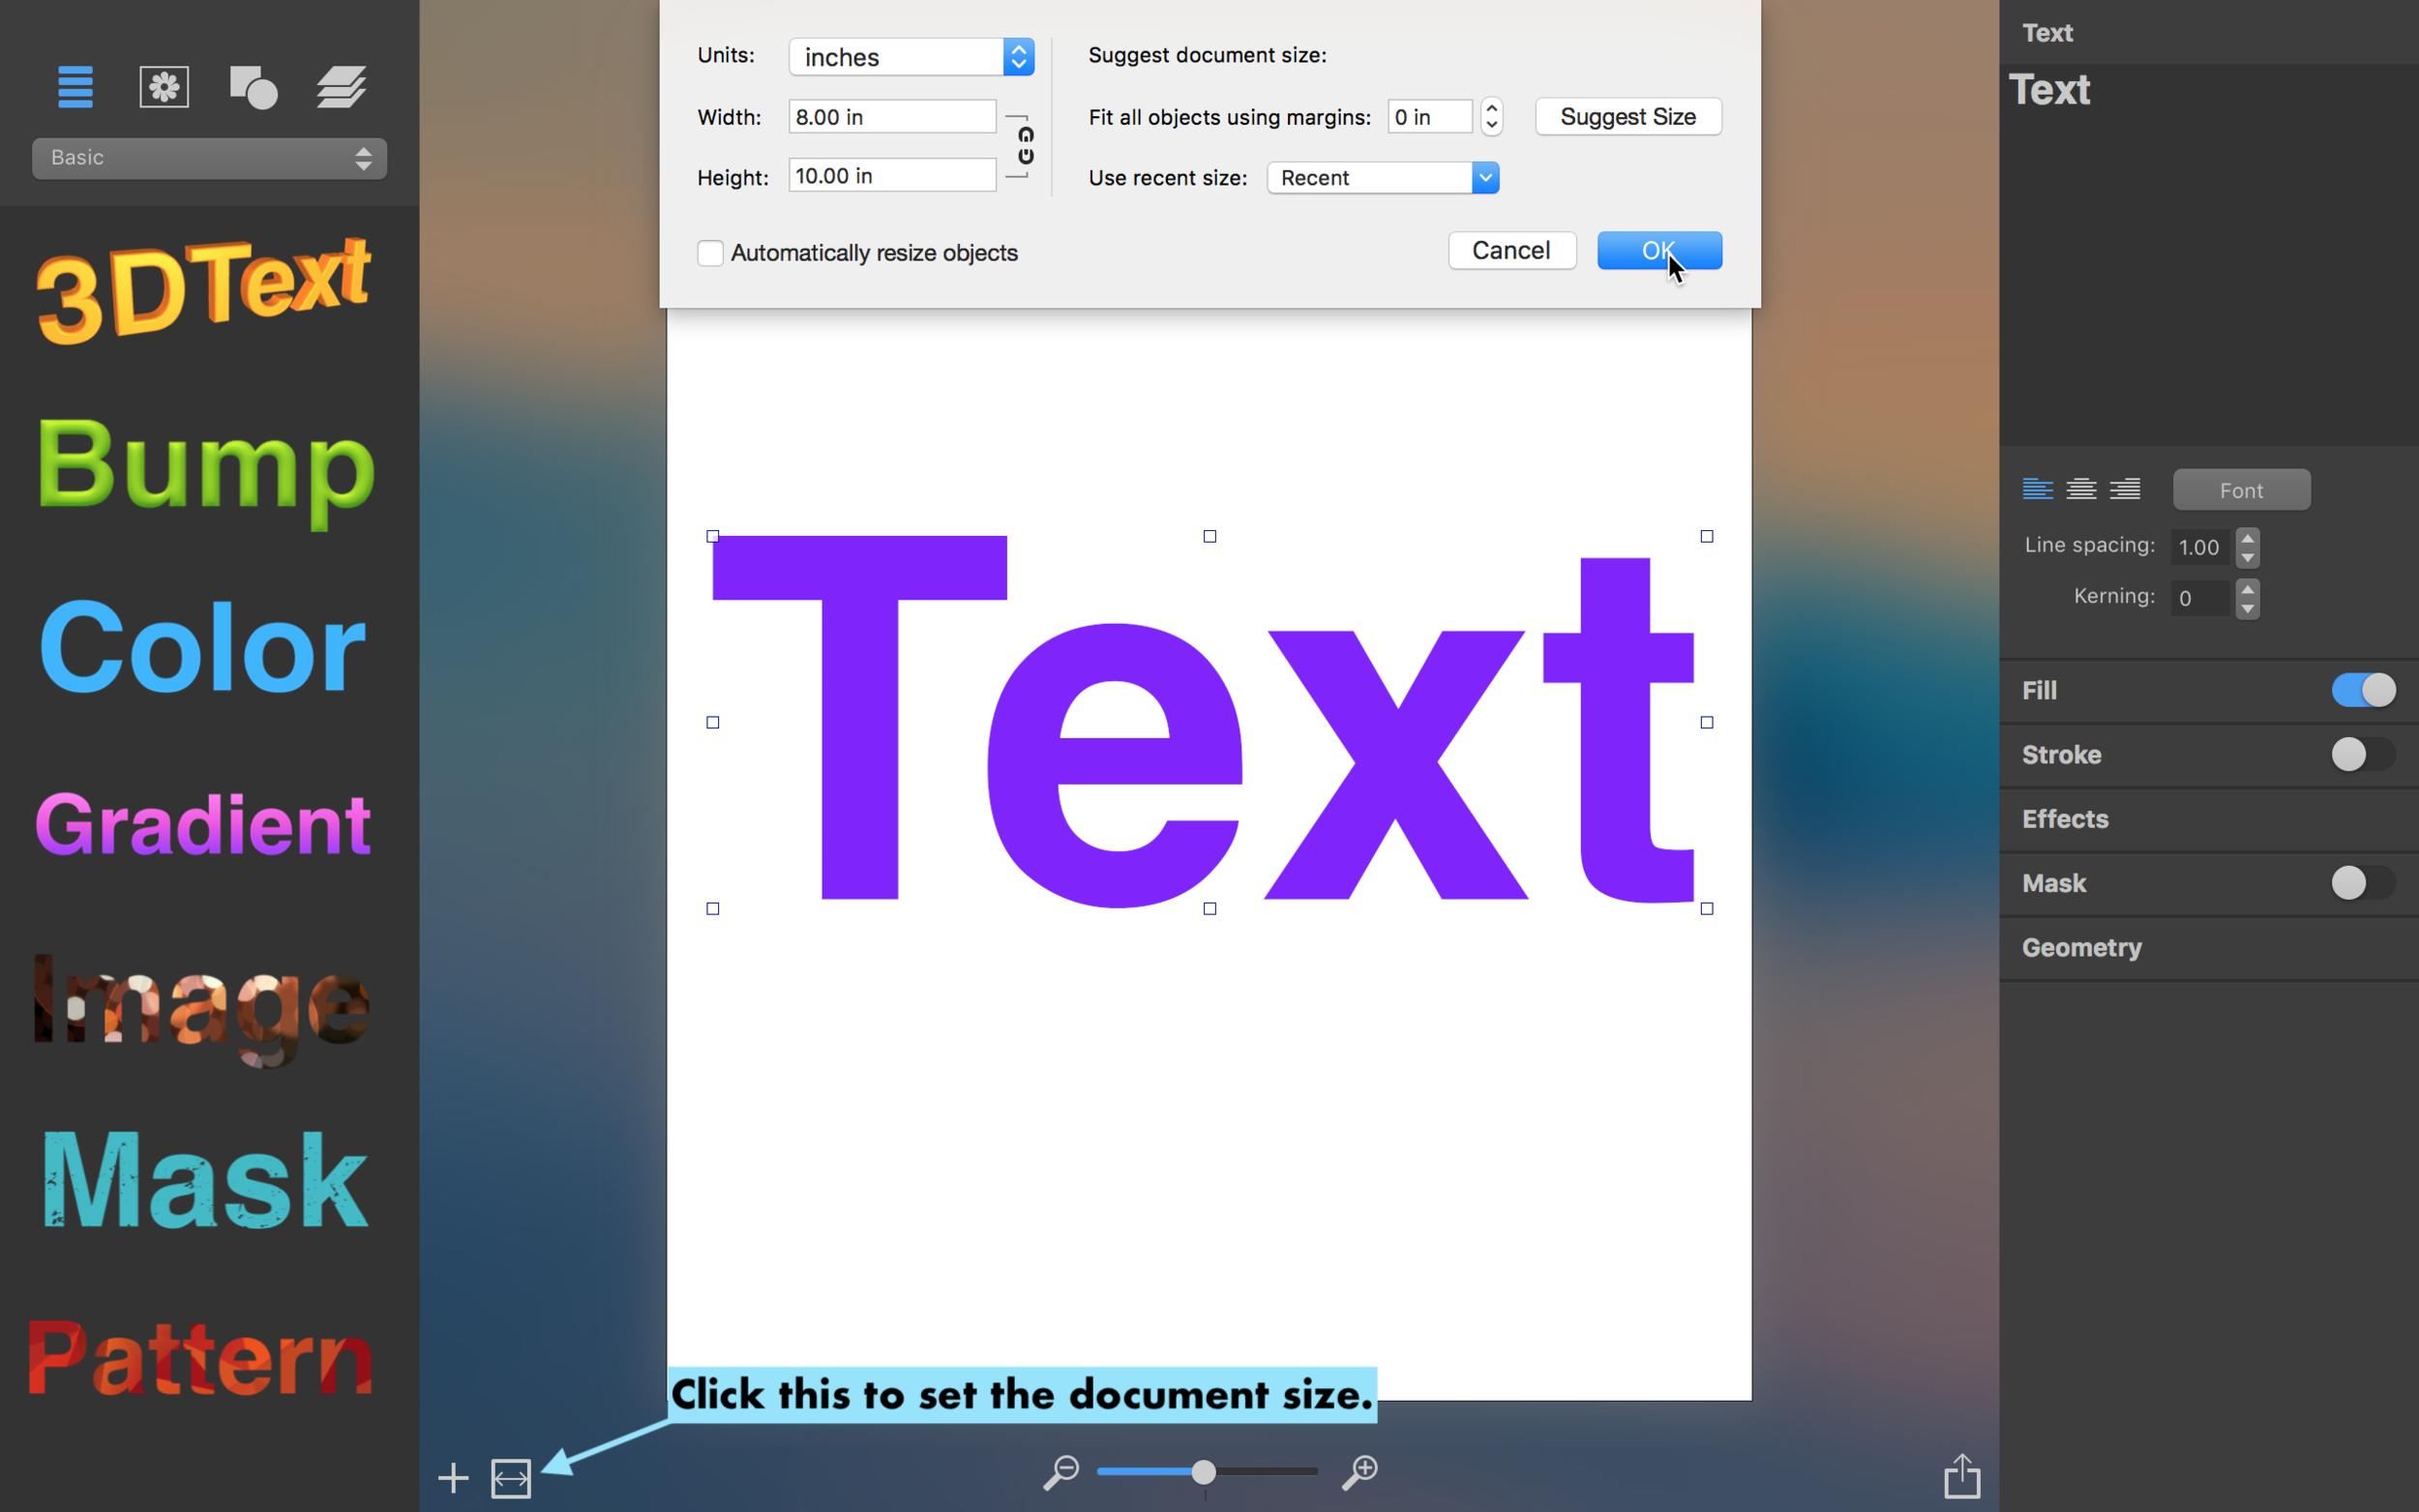 art-text-app-2nd-step.png